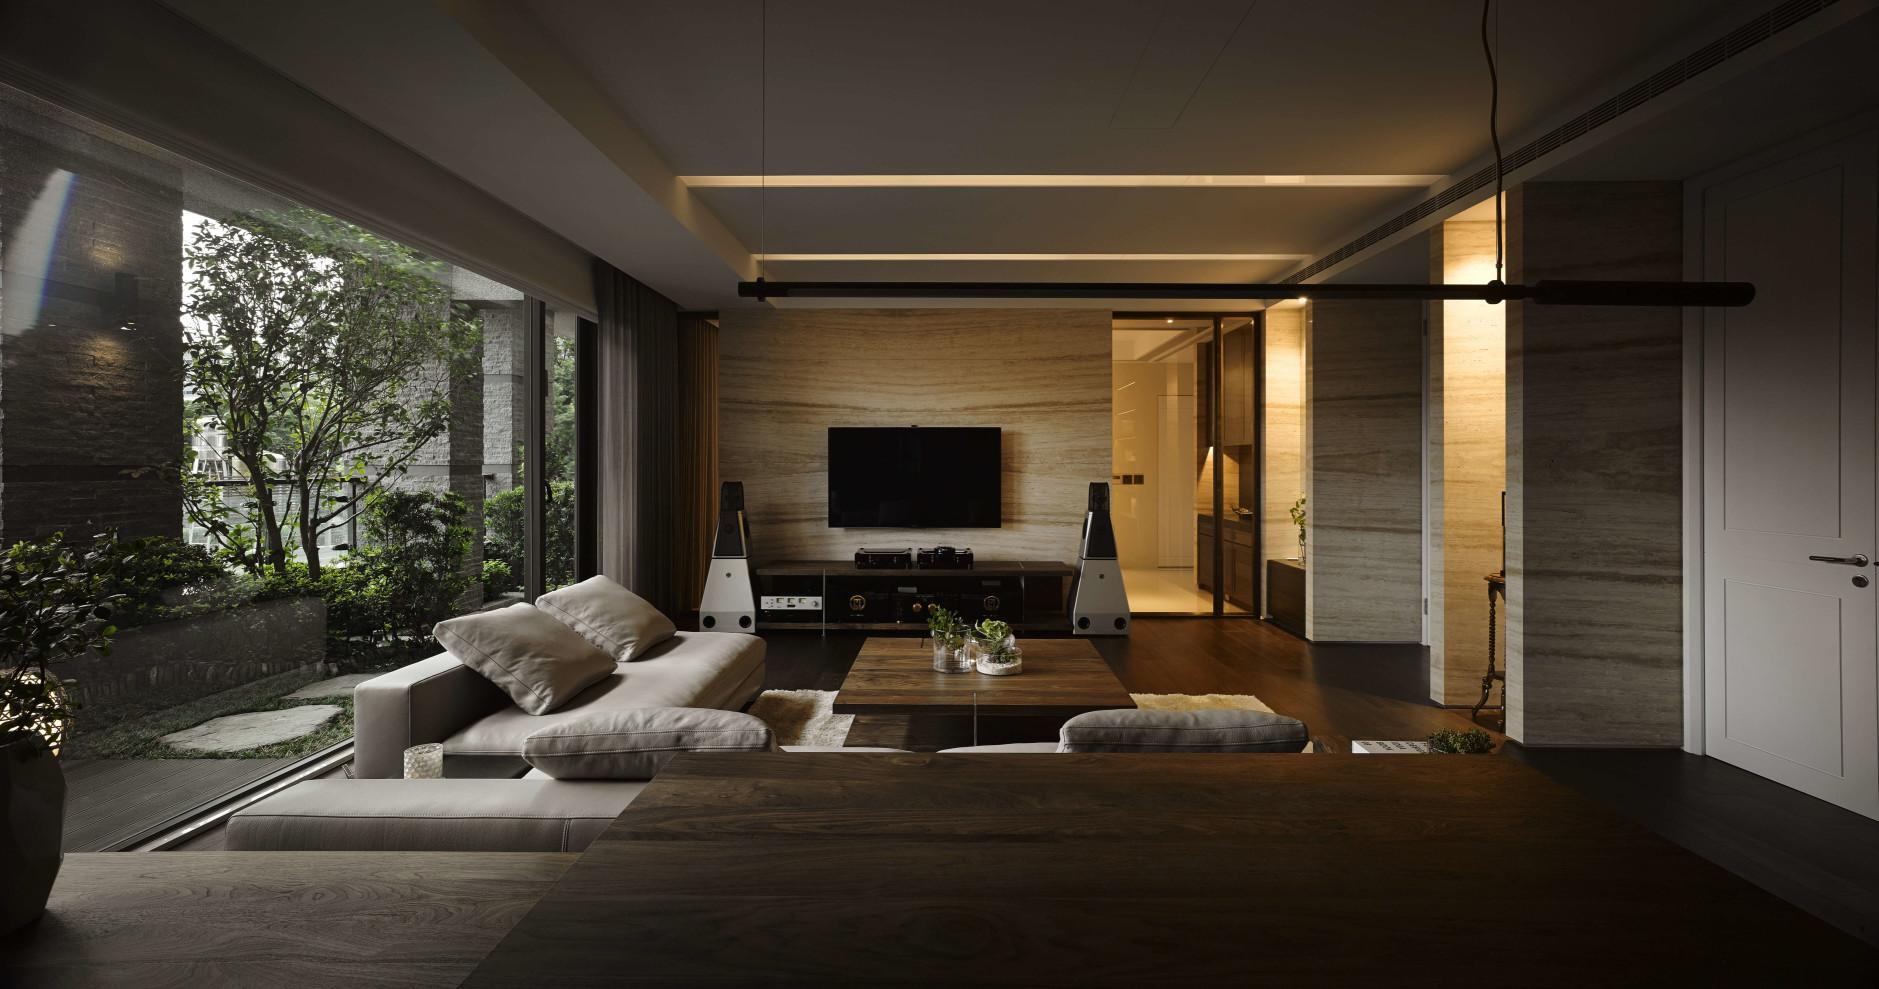 Y House入圍 INSIDE(World Festival of Interiors)世界室內設計節4-分子室內裝修設計公司